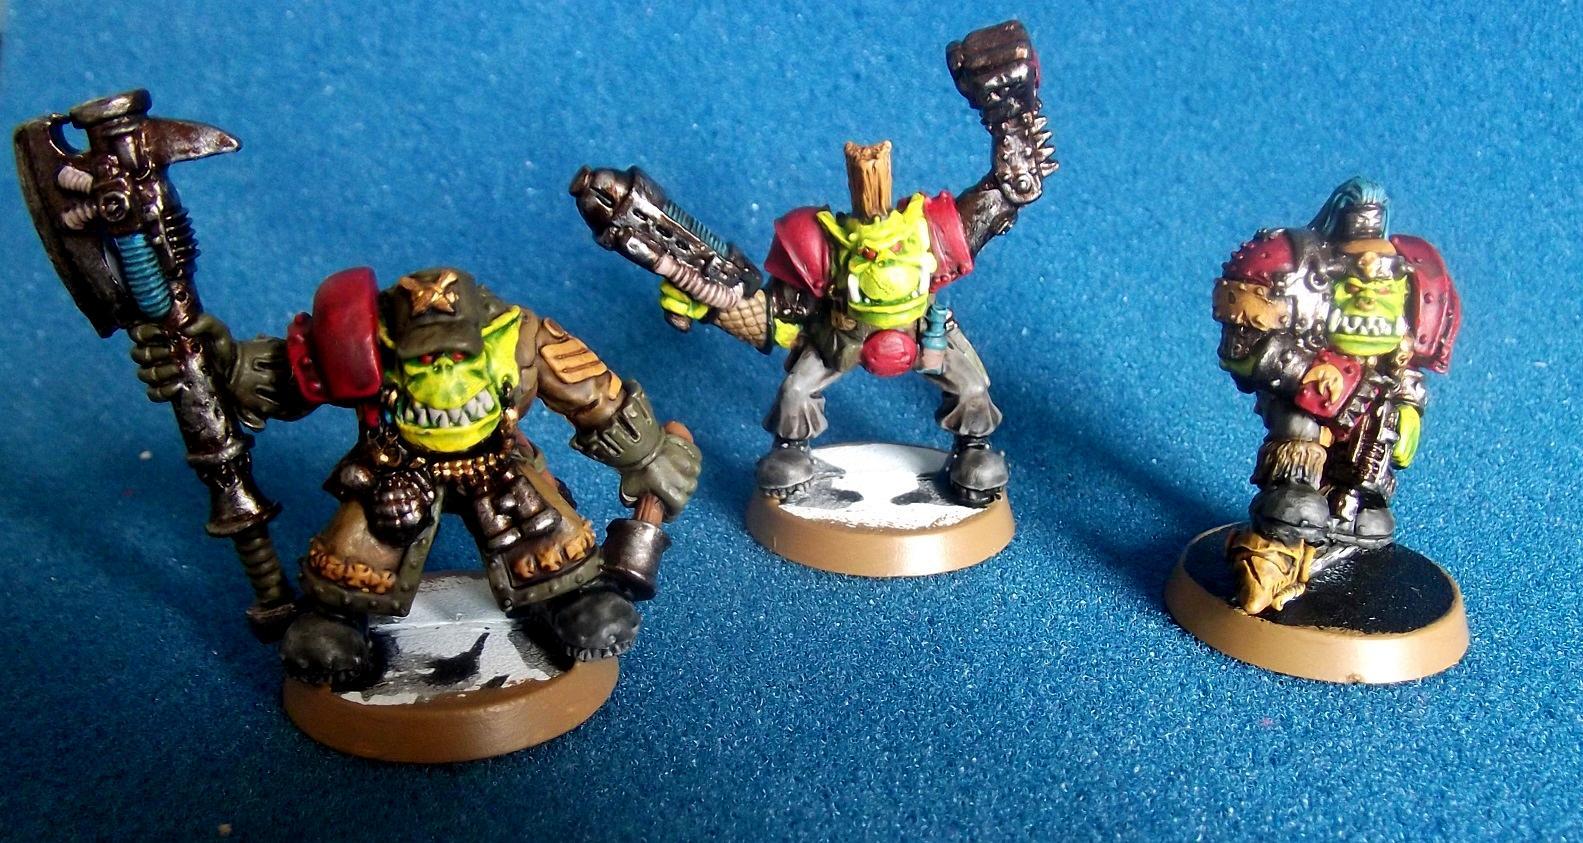 Nob, Old School, Orks, Rogue Trader